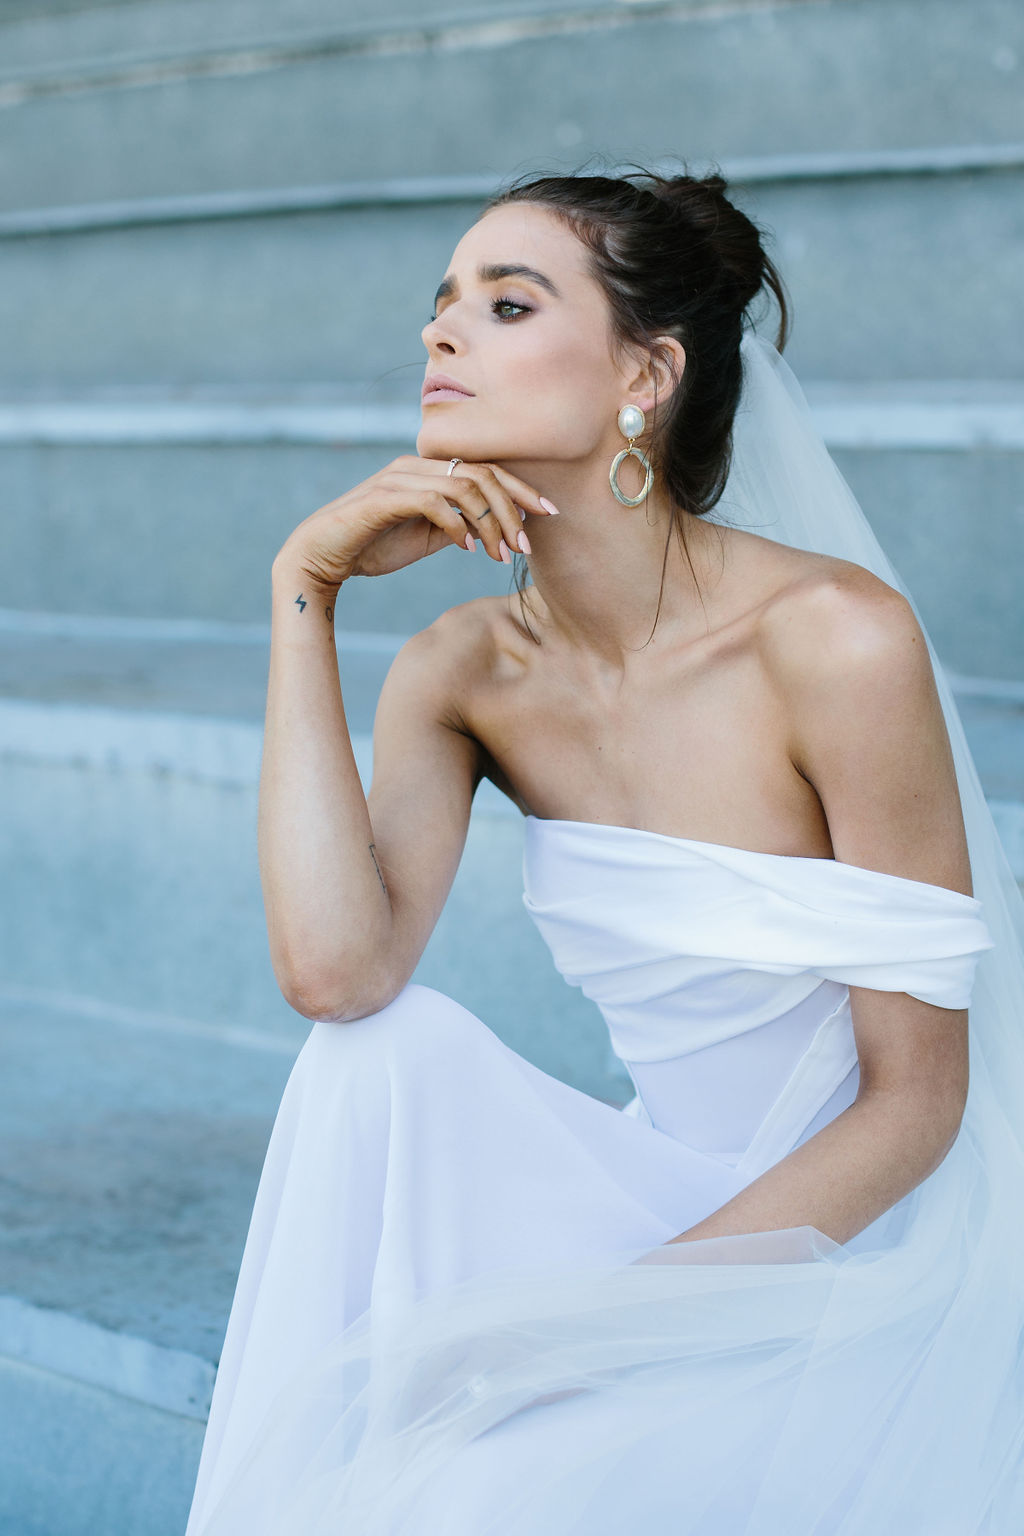 bridal-and-wedding-earrings-maleny-large-gold-pearl-statement-wedding-earrings-111.jpg